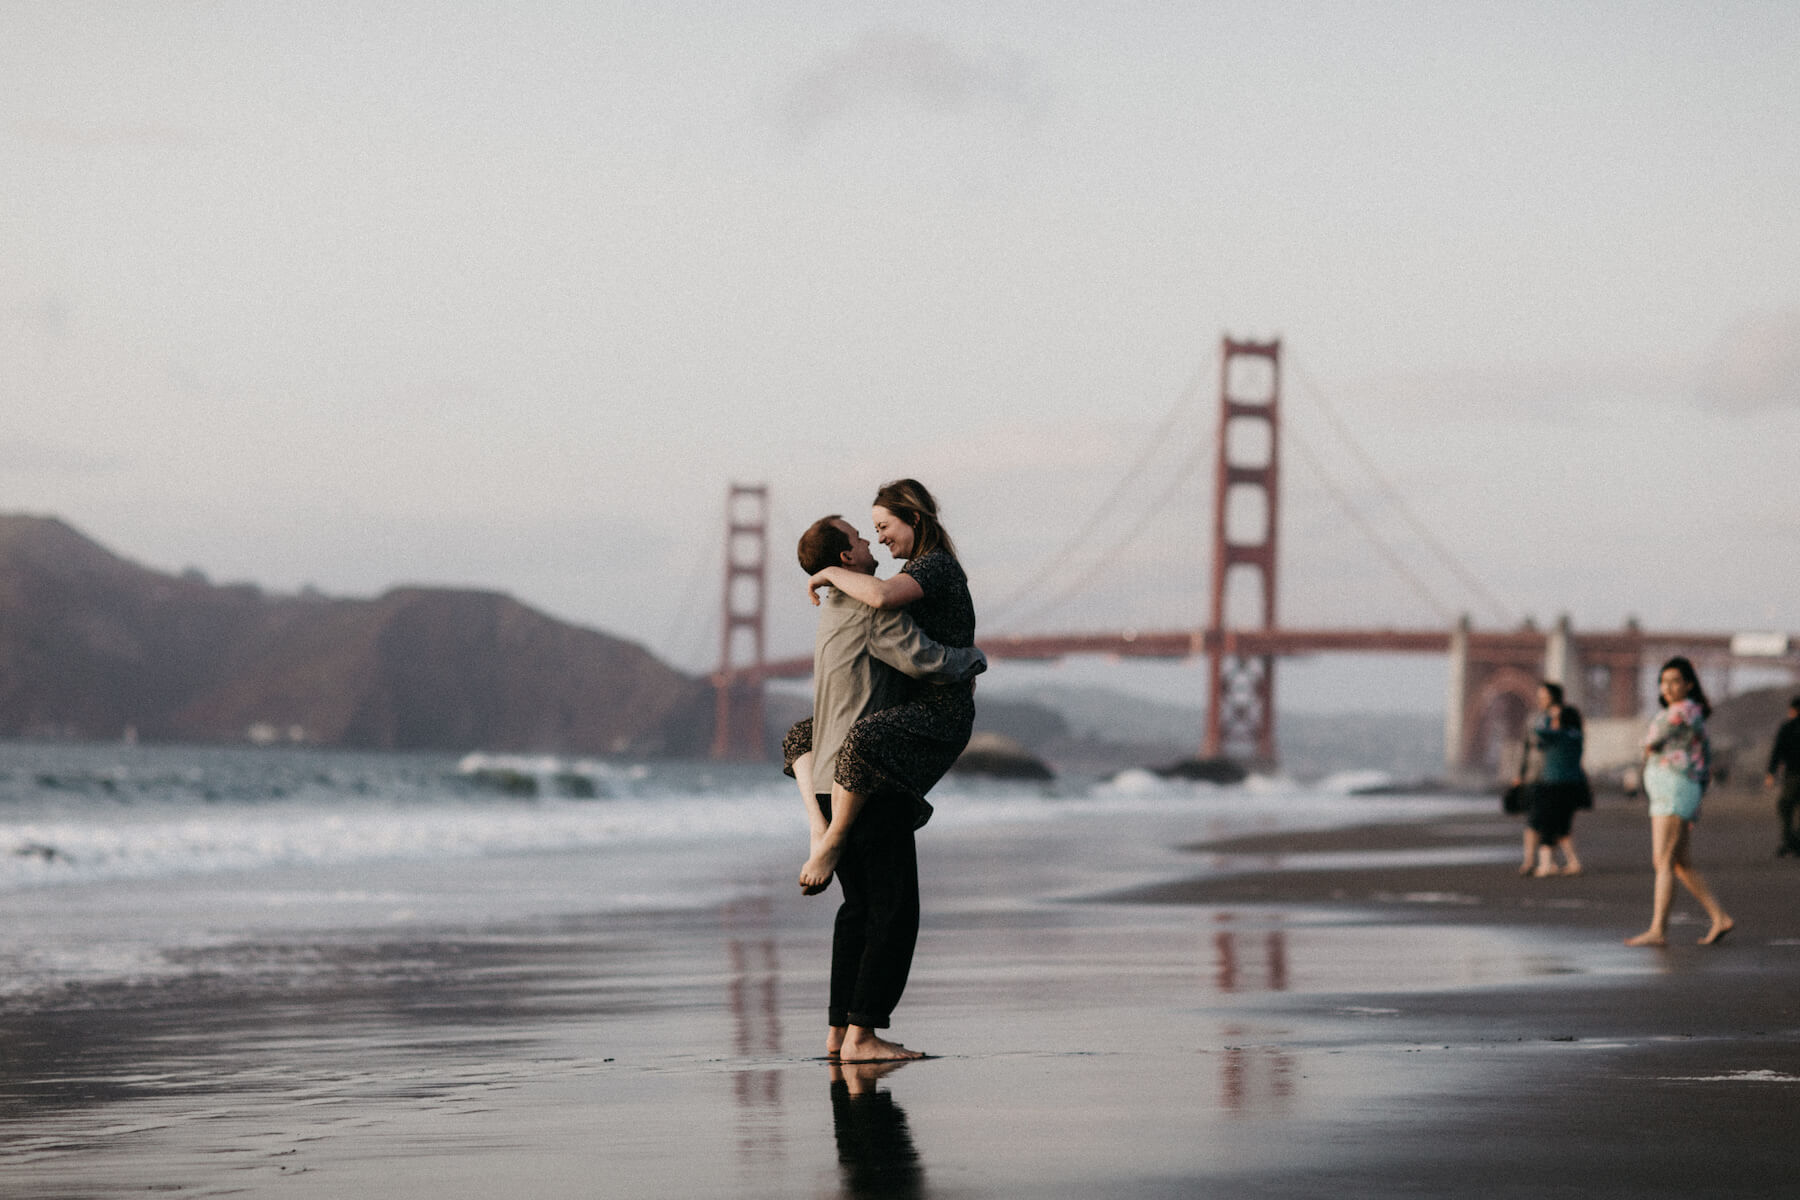 san-francisco-09-29-2019-couples-trip-48_original